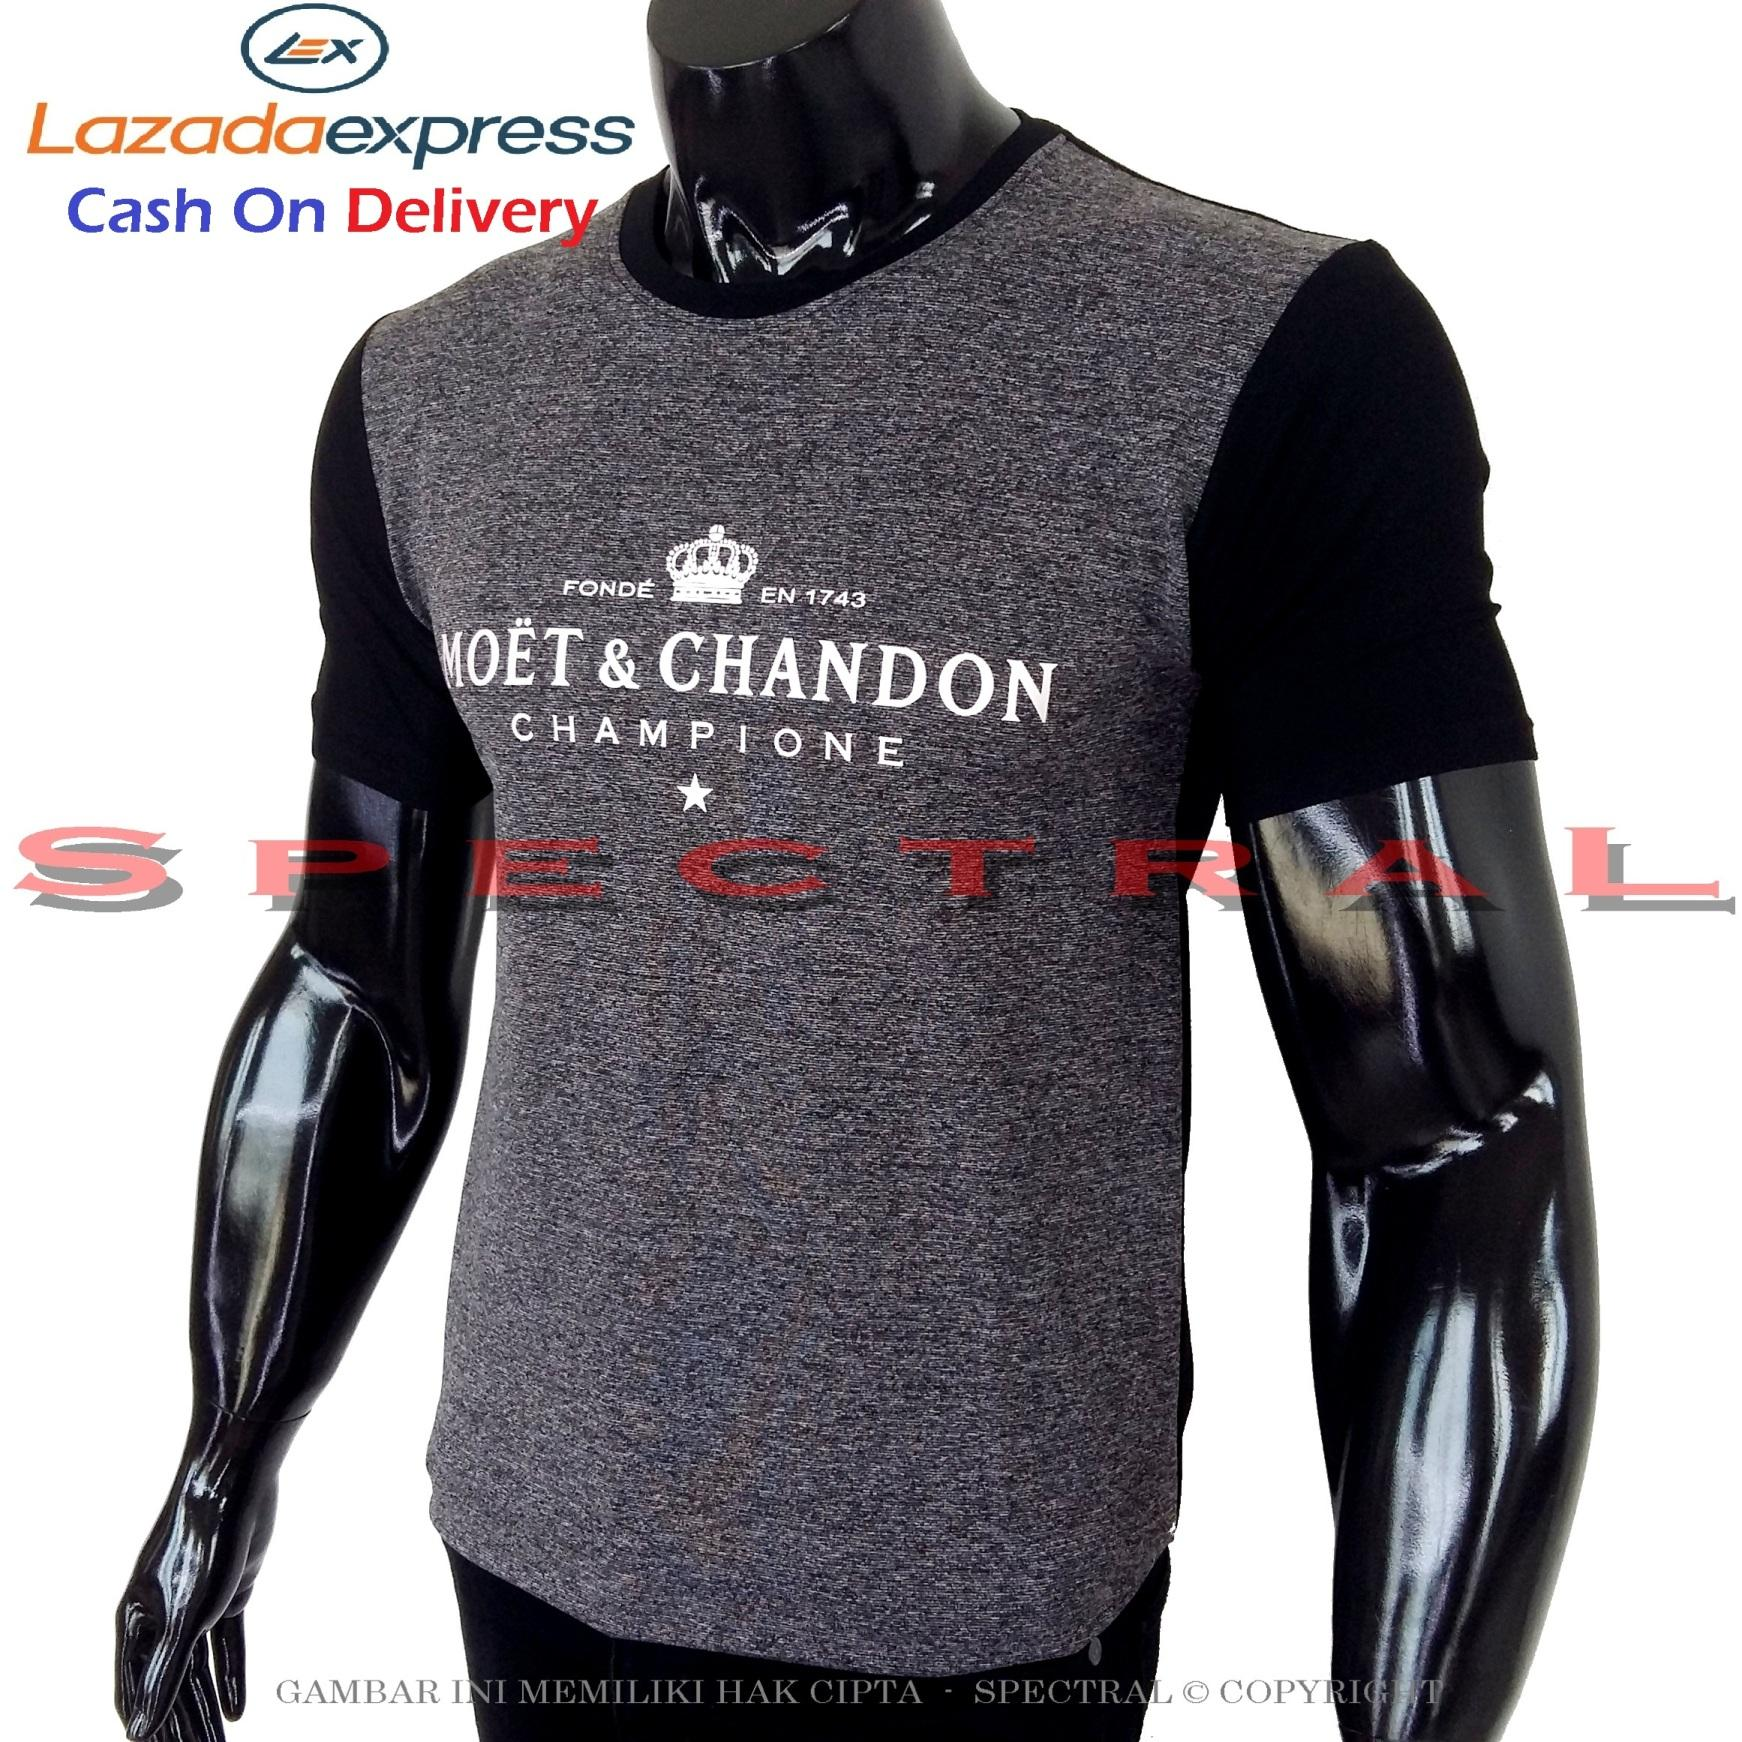 Spectral - Kaos Distro MOET & CHANDON Soft Rayon Viscose Lycra Pola M Fit To L Simple Fashionable T